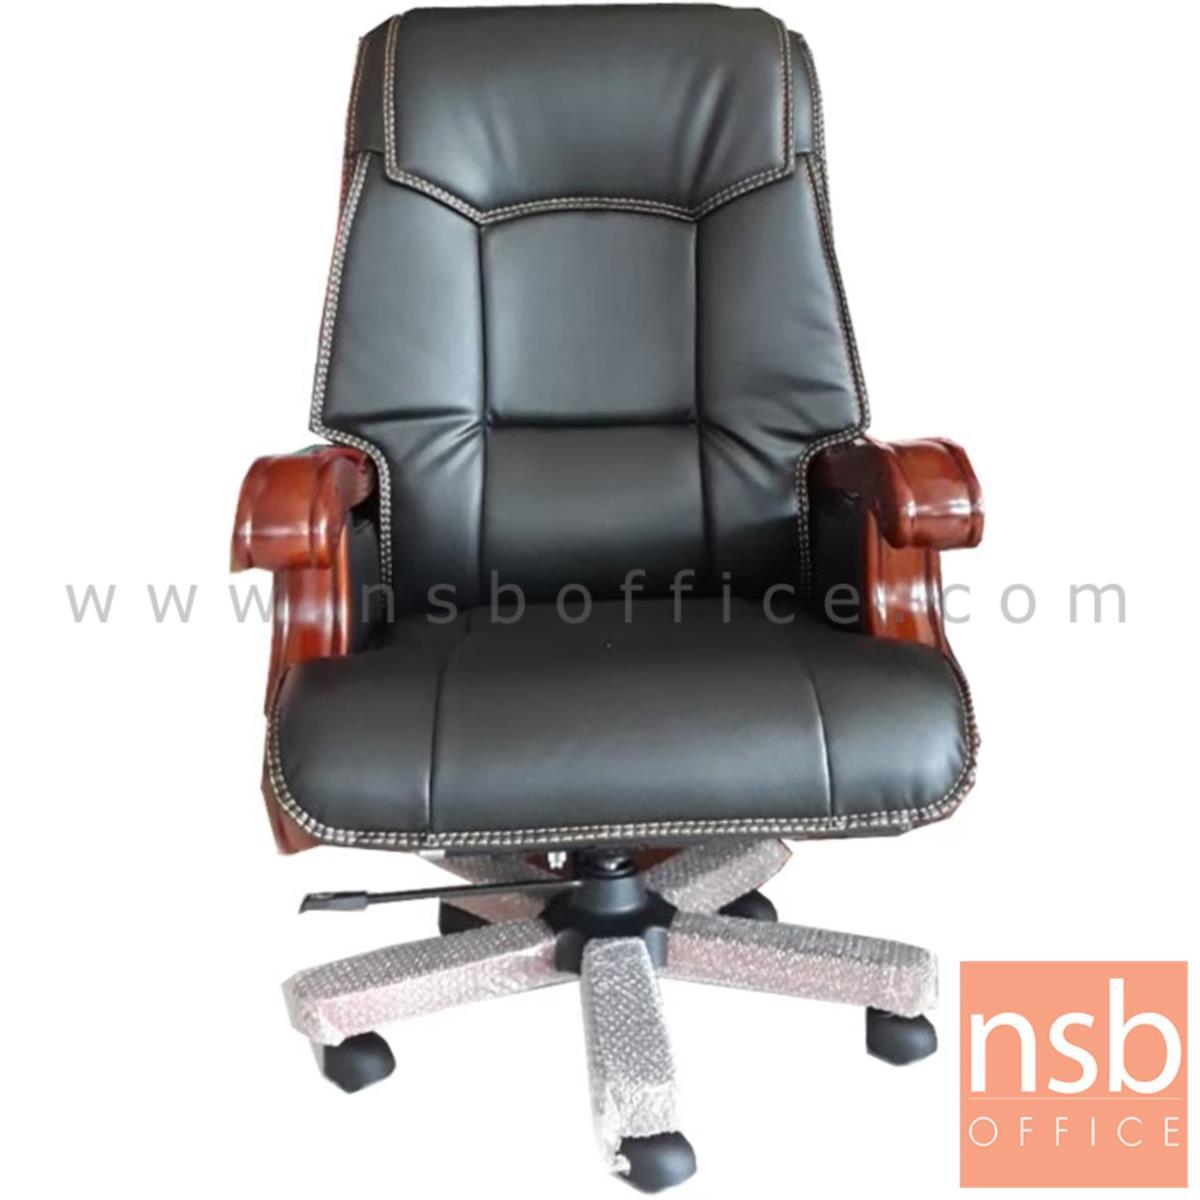 B25A110:เก้าอี้ผู้บริหารหุ้มหนัง PU รุ่น Rayborn (เรย์บอร์น)  โช๊คแก๊ส ก้อนโยก ขาไม้